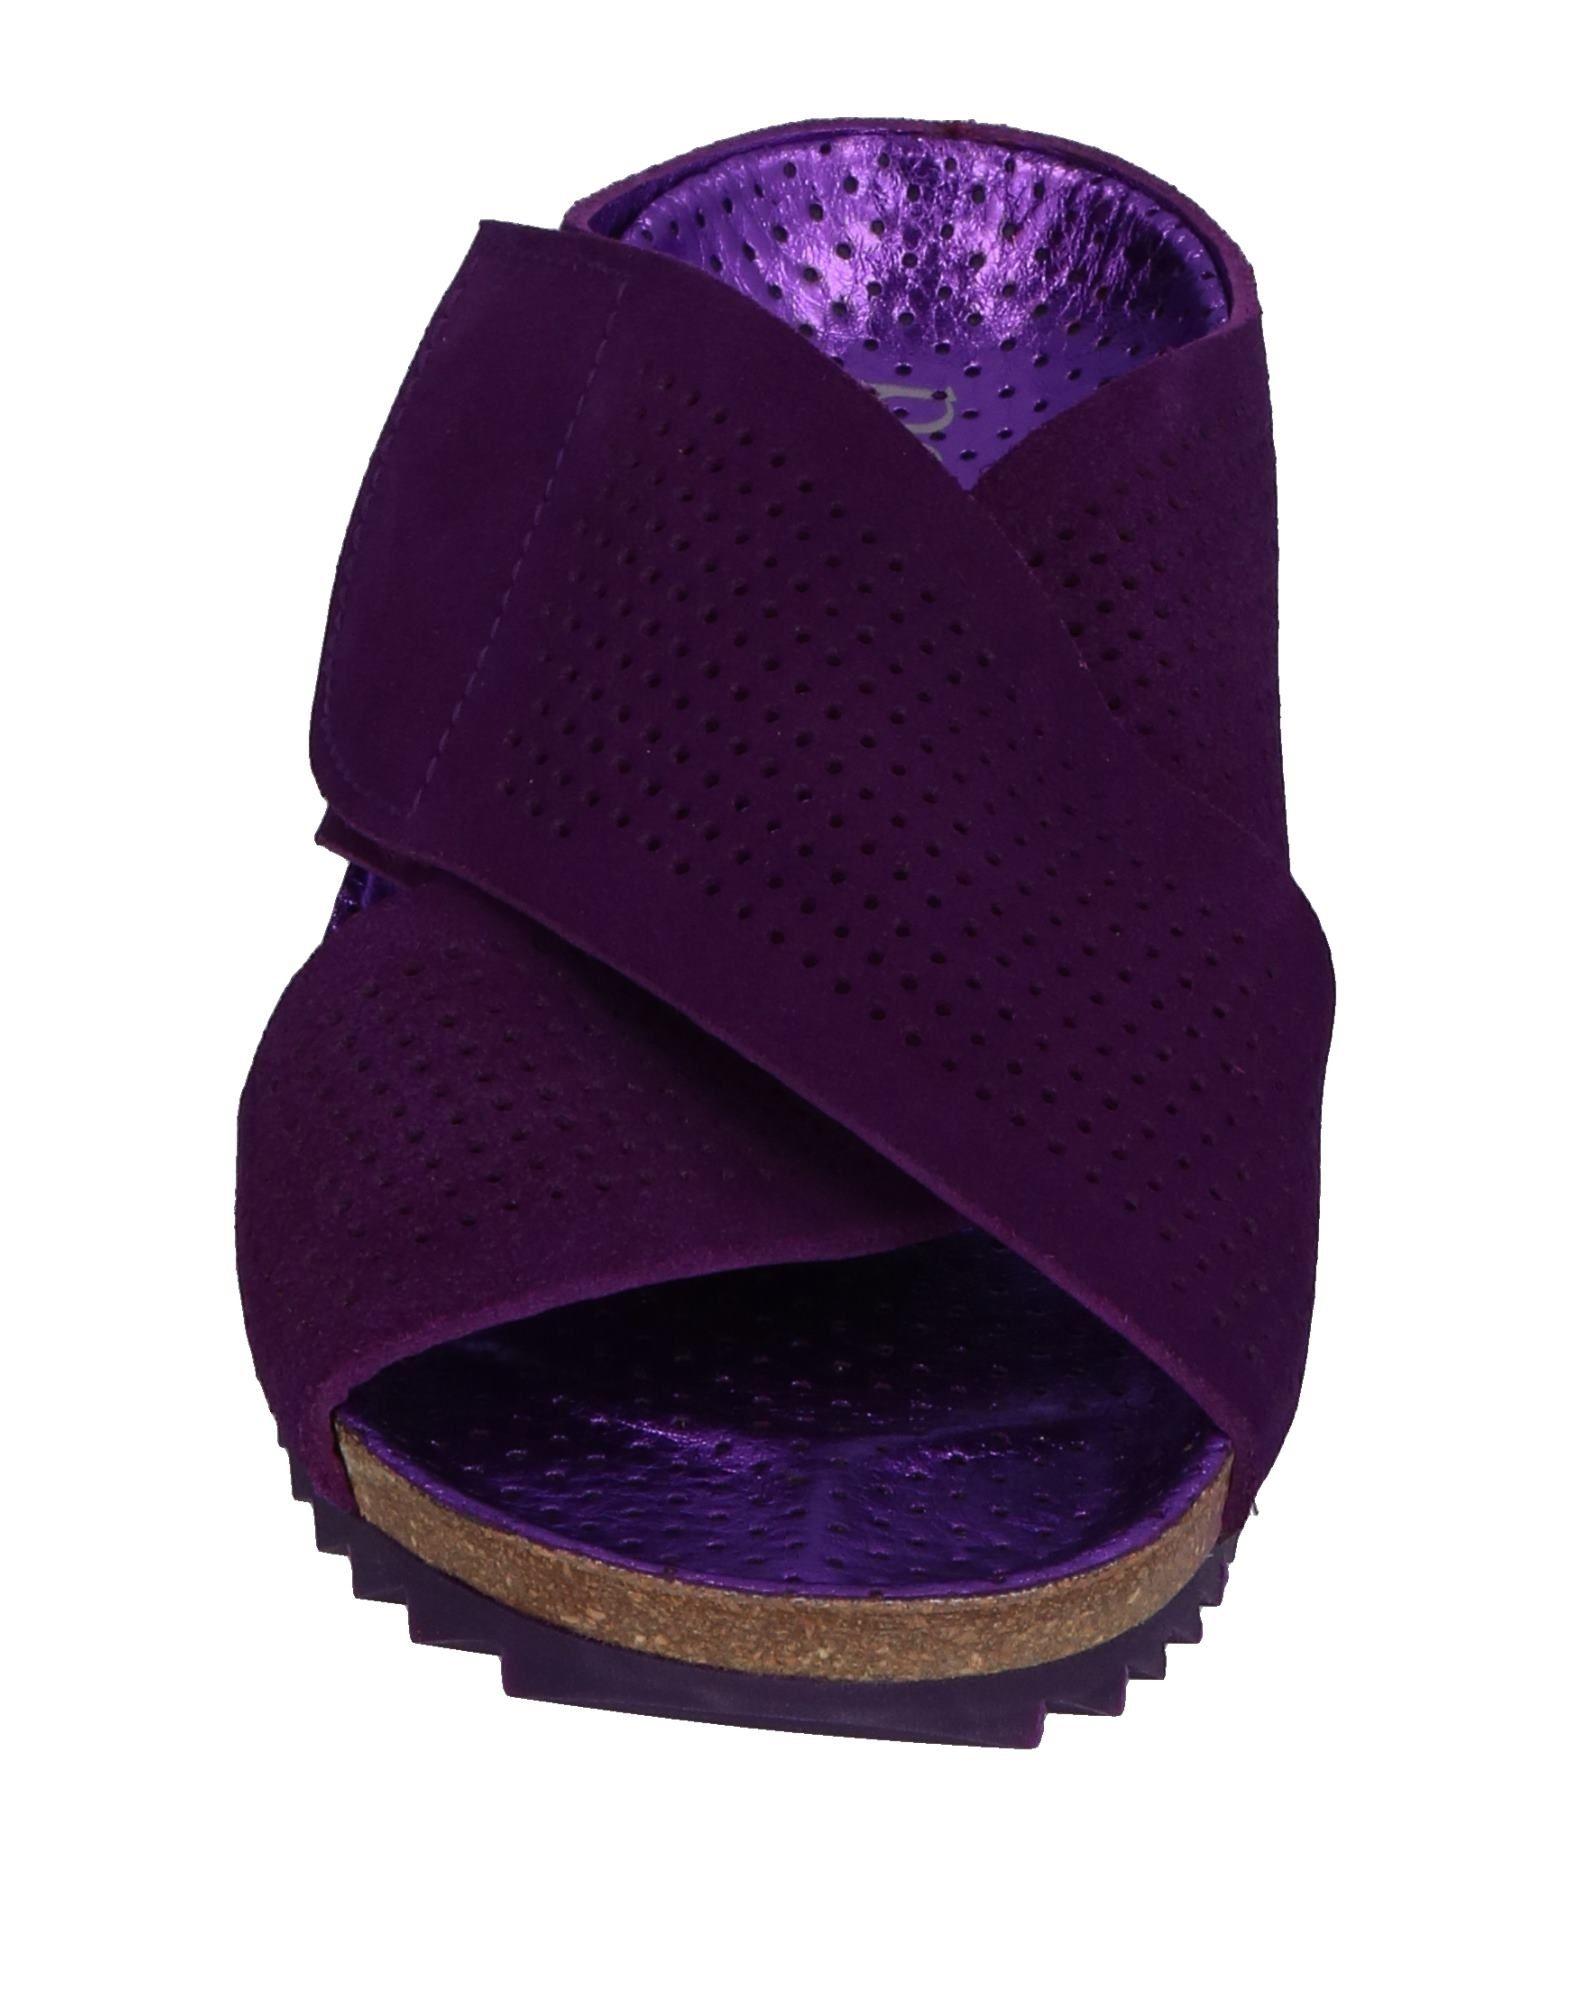 Pedro García Sandalen Damen Gute  11407692RS Gute Damen Qualität beliebte Schuhe 1c2362